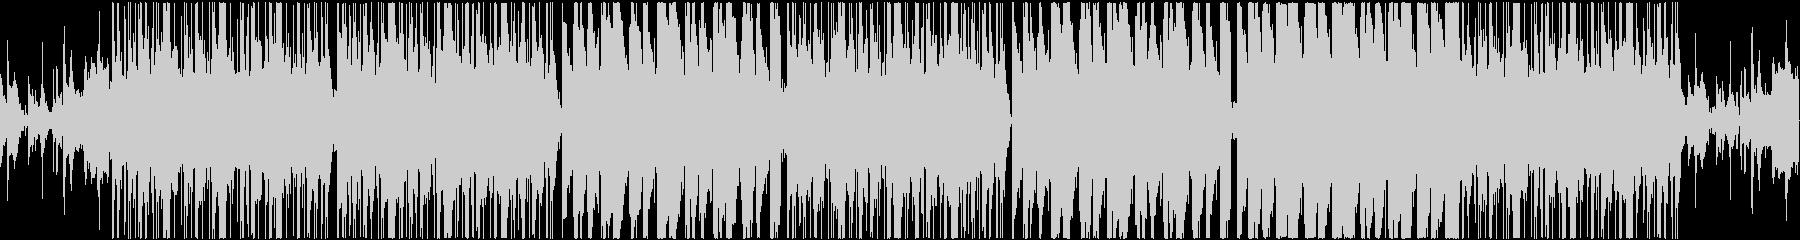 [lo-fi hip-hop] ダーク感の未再生の波形